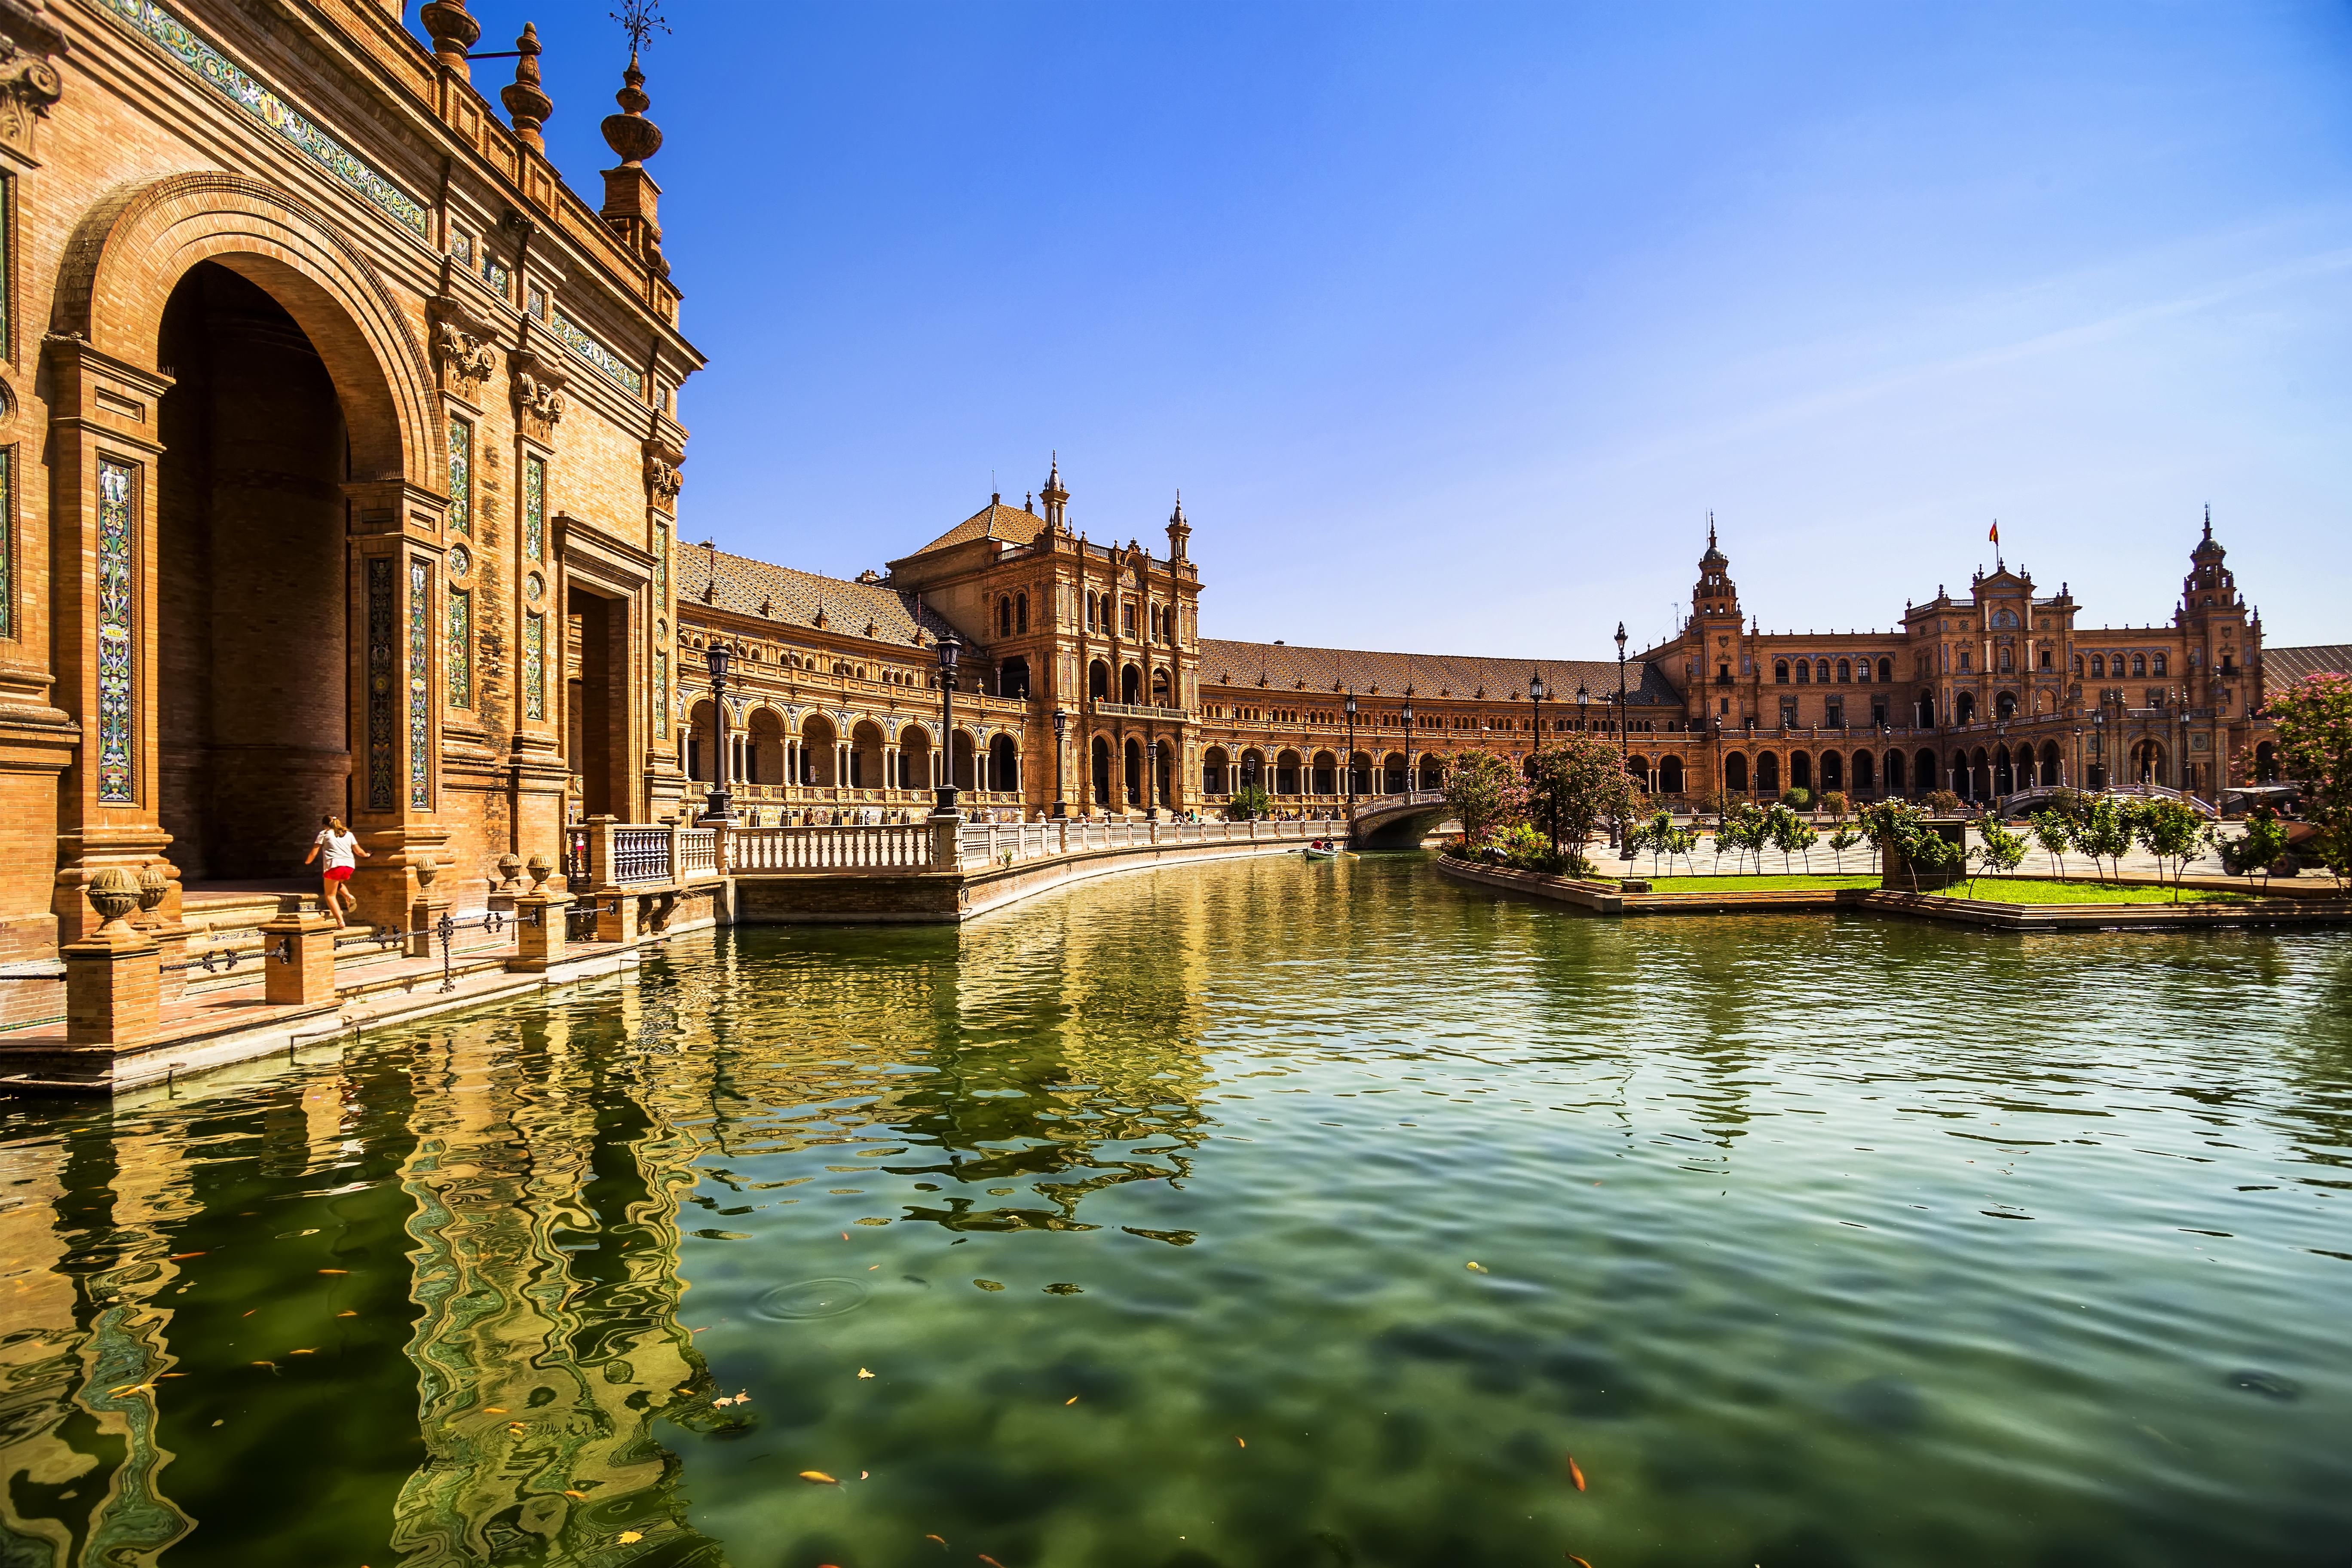 Destination image of Spain